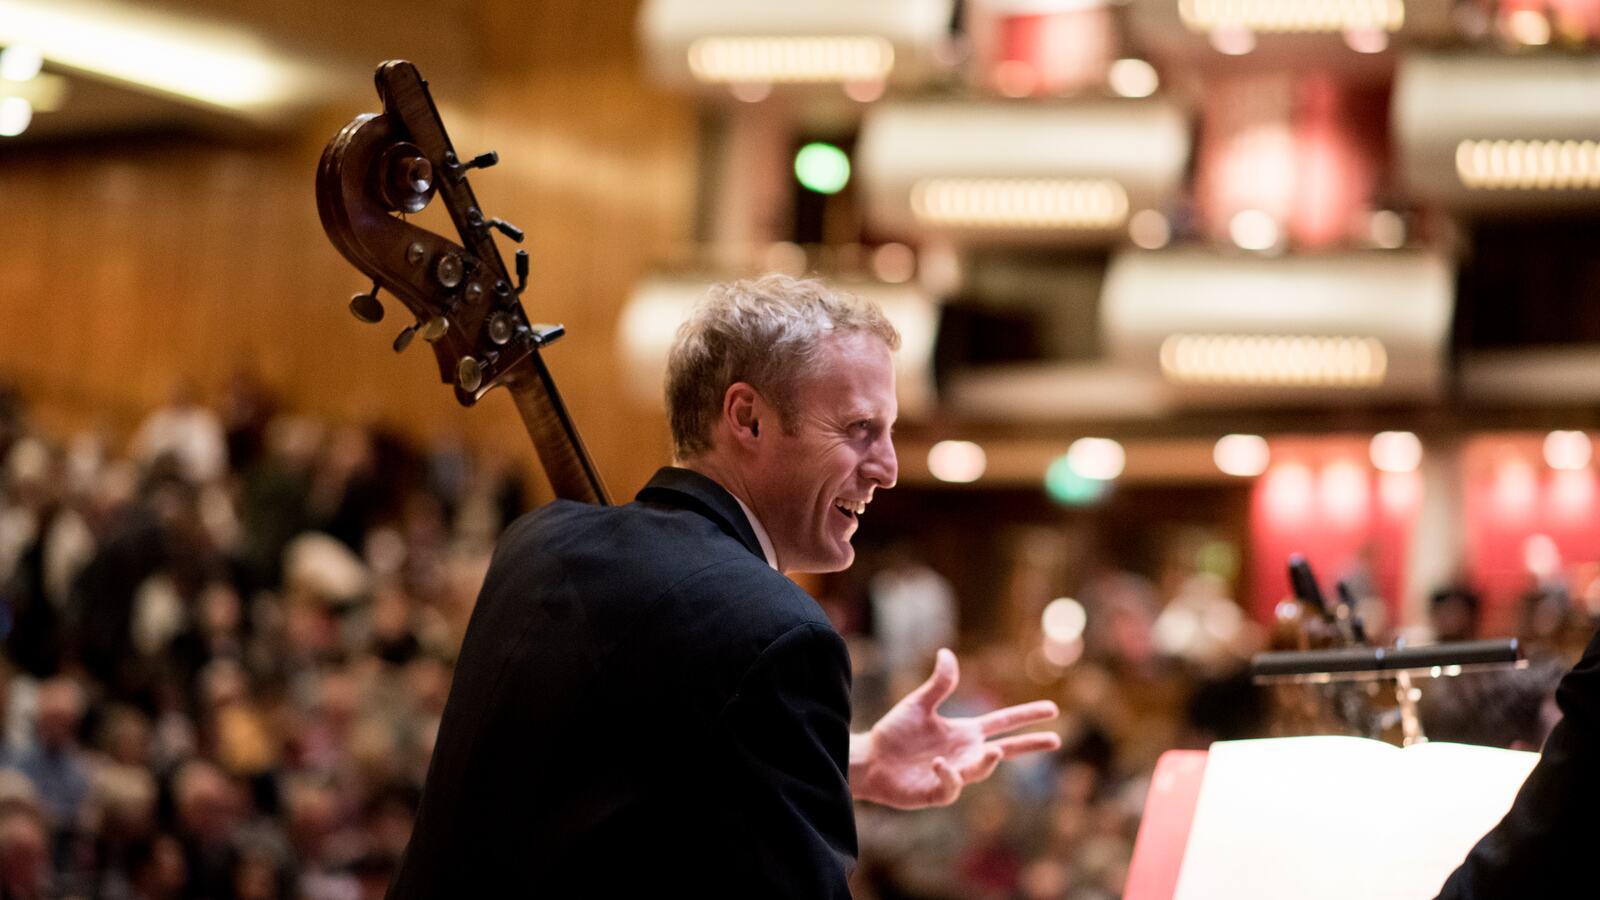 Musician in Philharmonia Orchestra